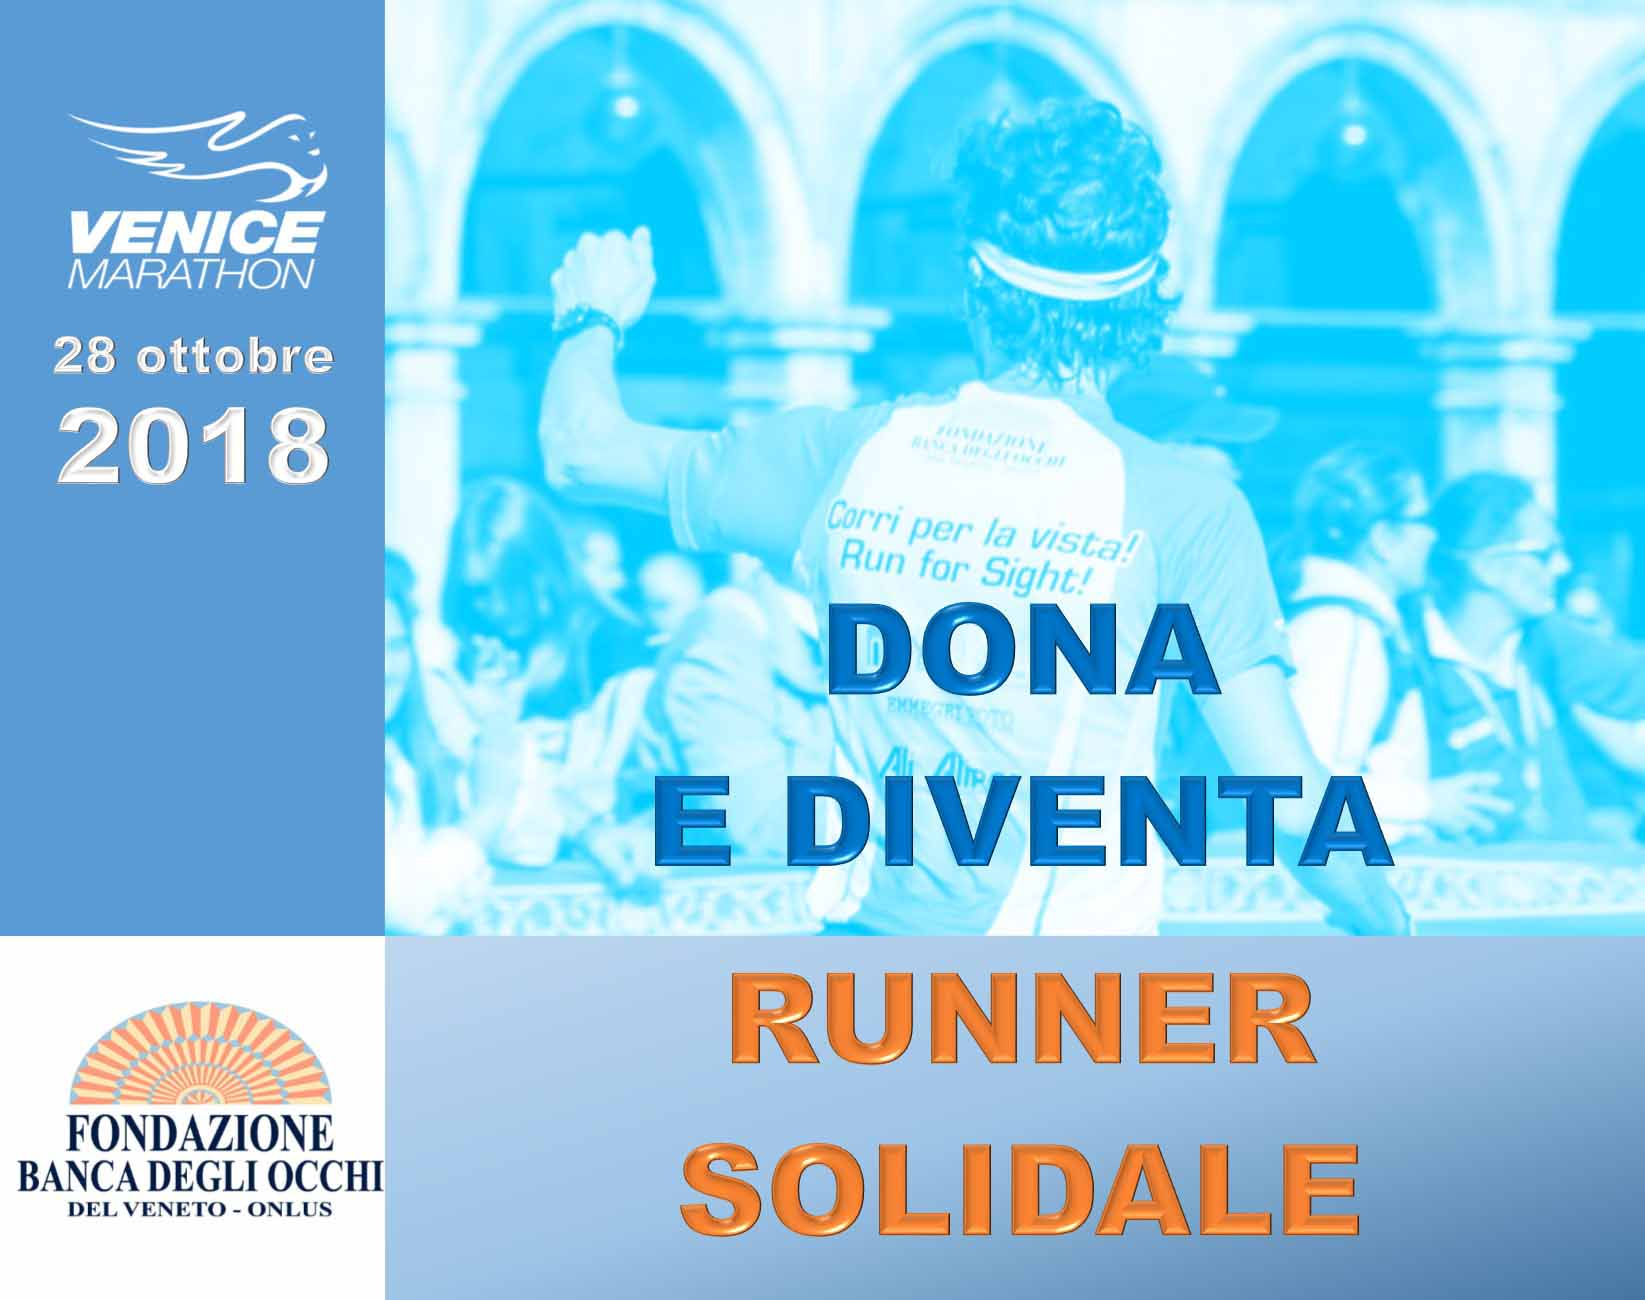 Venicemarathon 2018: diventa runner solidale